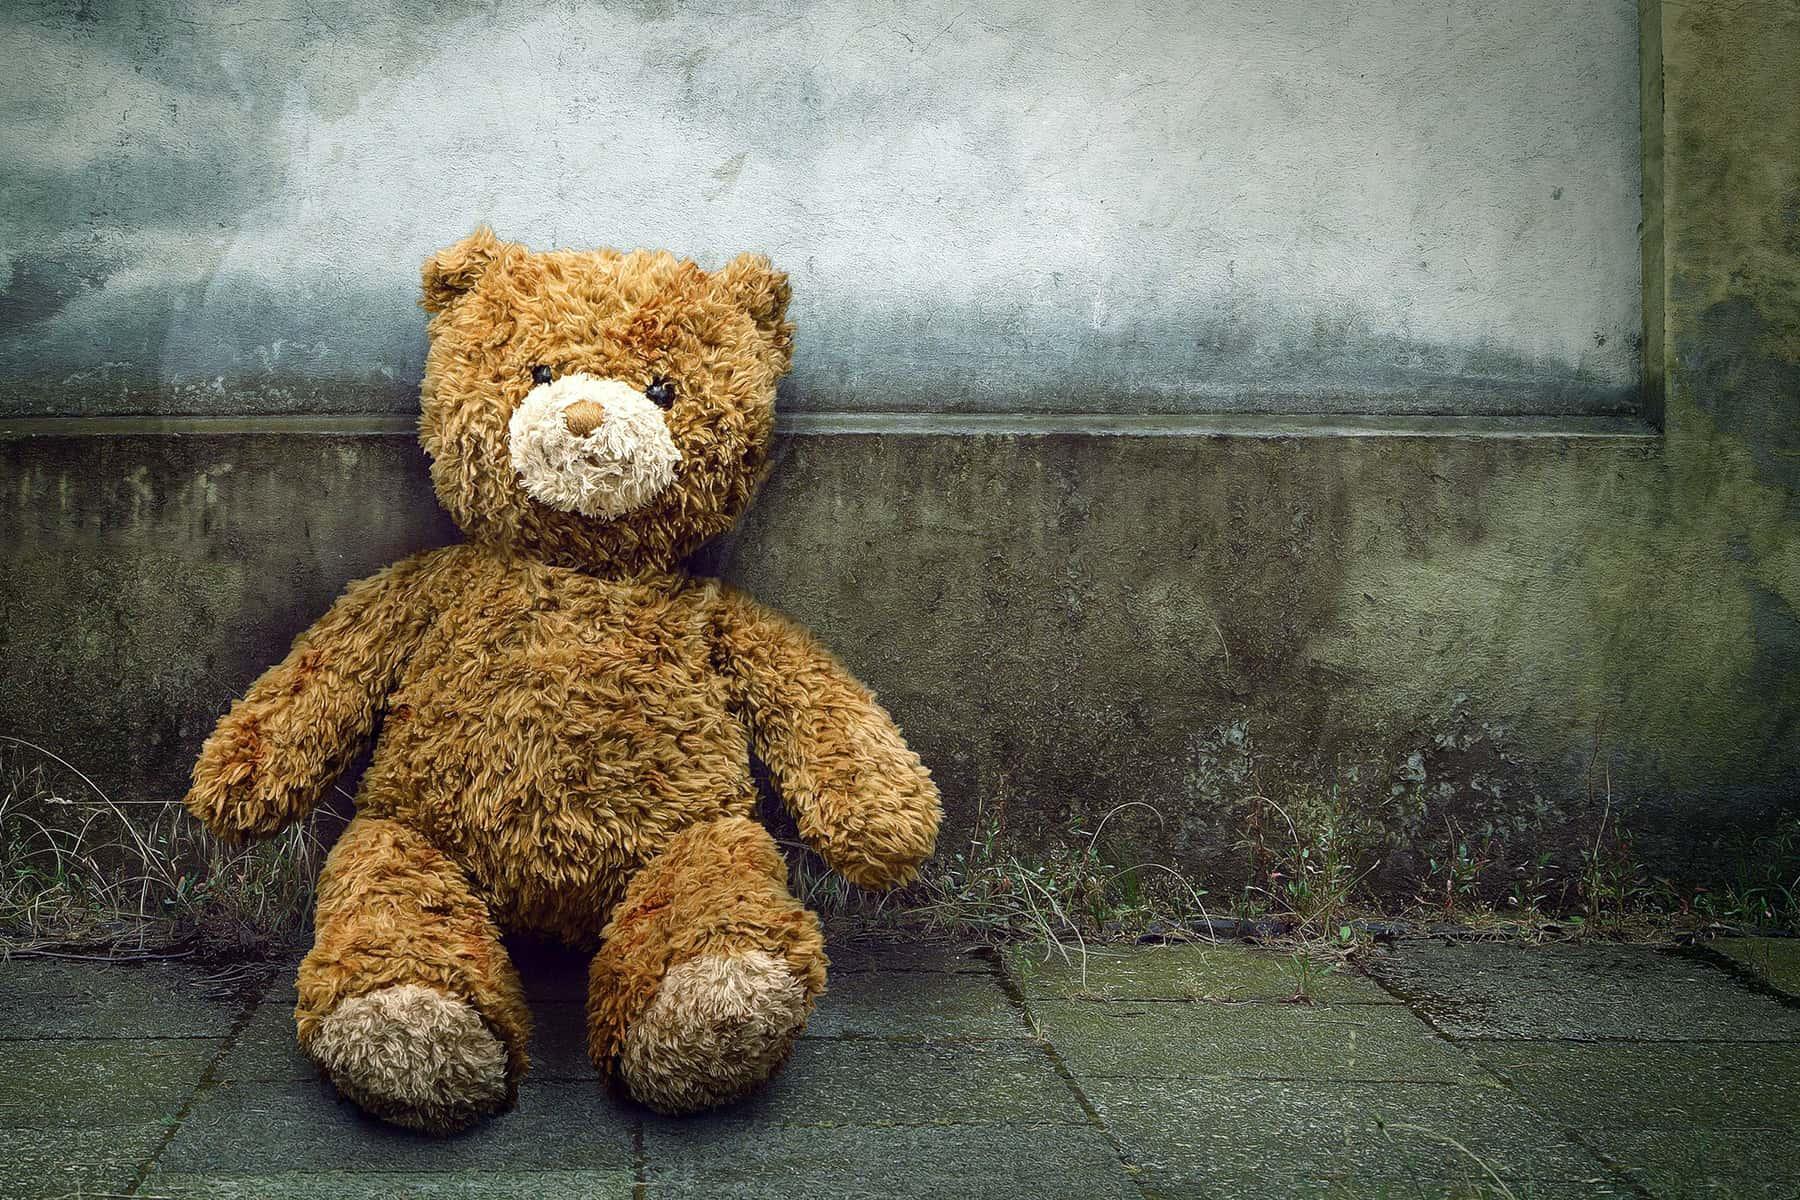 022220_homelessyouth_02